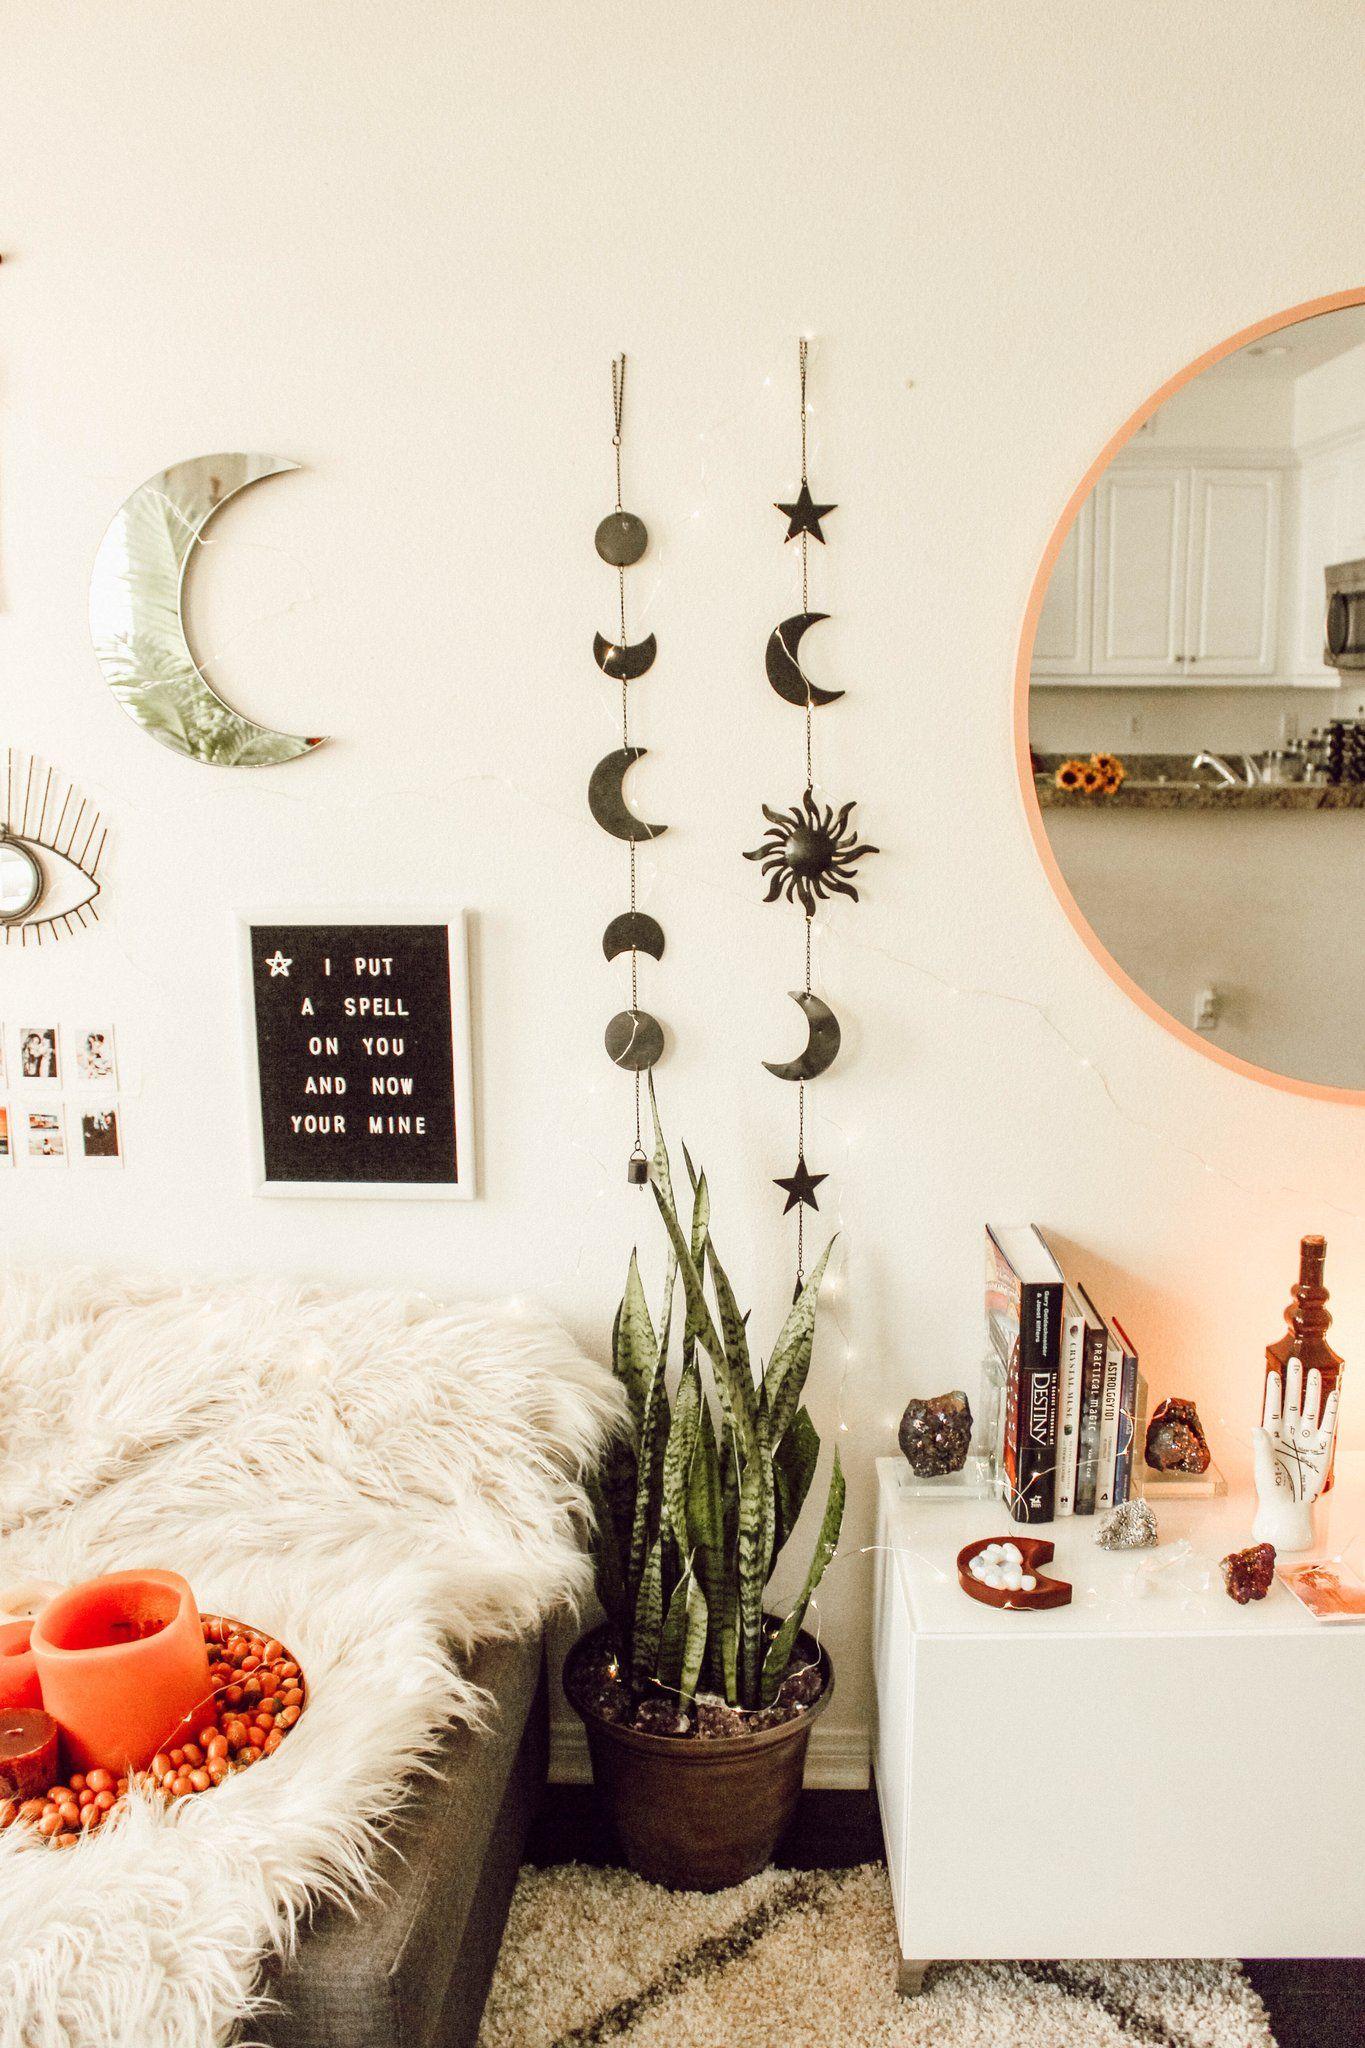 Celestial Wall Hanging Cute Room Decor Bedroom Vintage Bedroom Decor